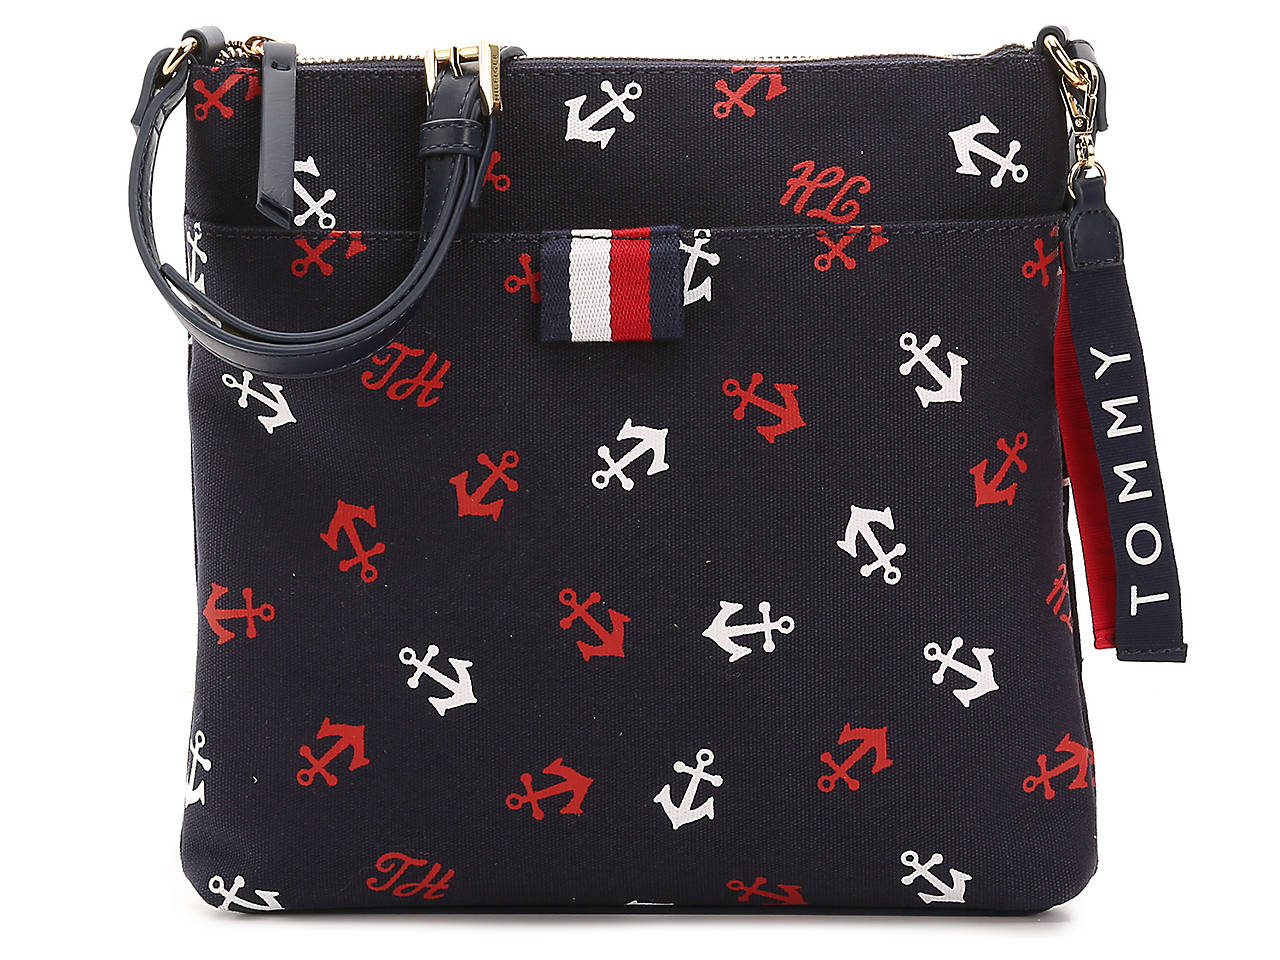 18793ecc3ba4 Tommy Hilfiger Anchor Crossbody Bag Women s Handbags   Accessories